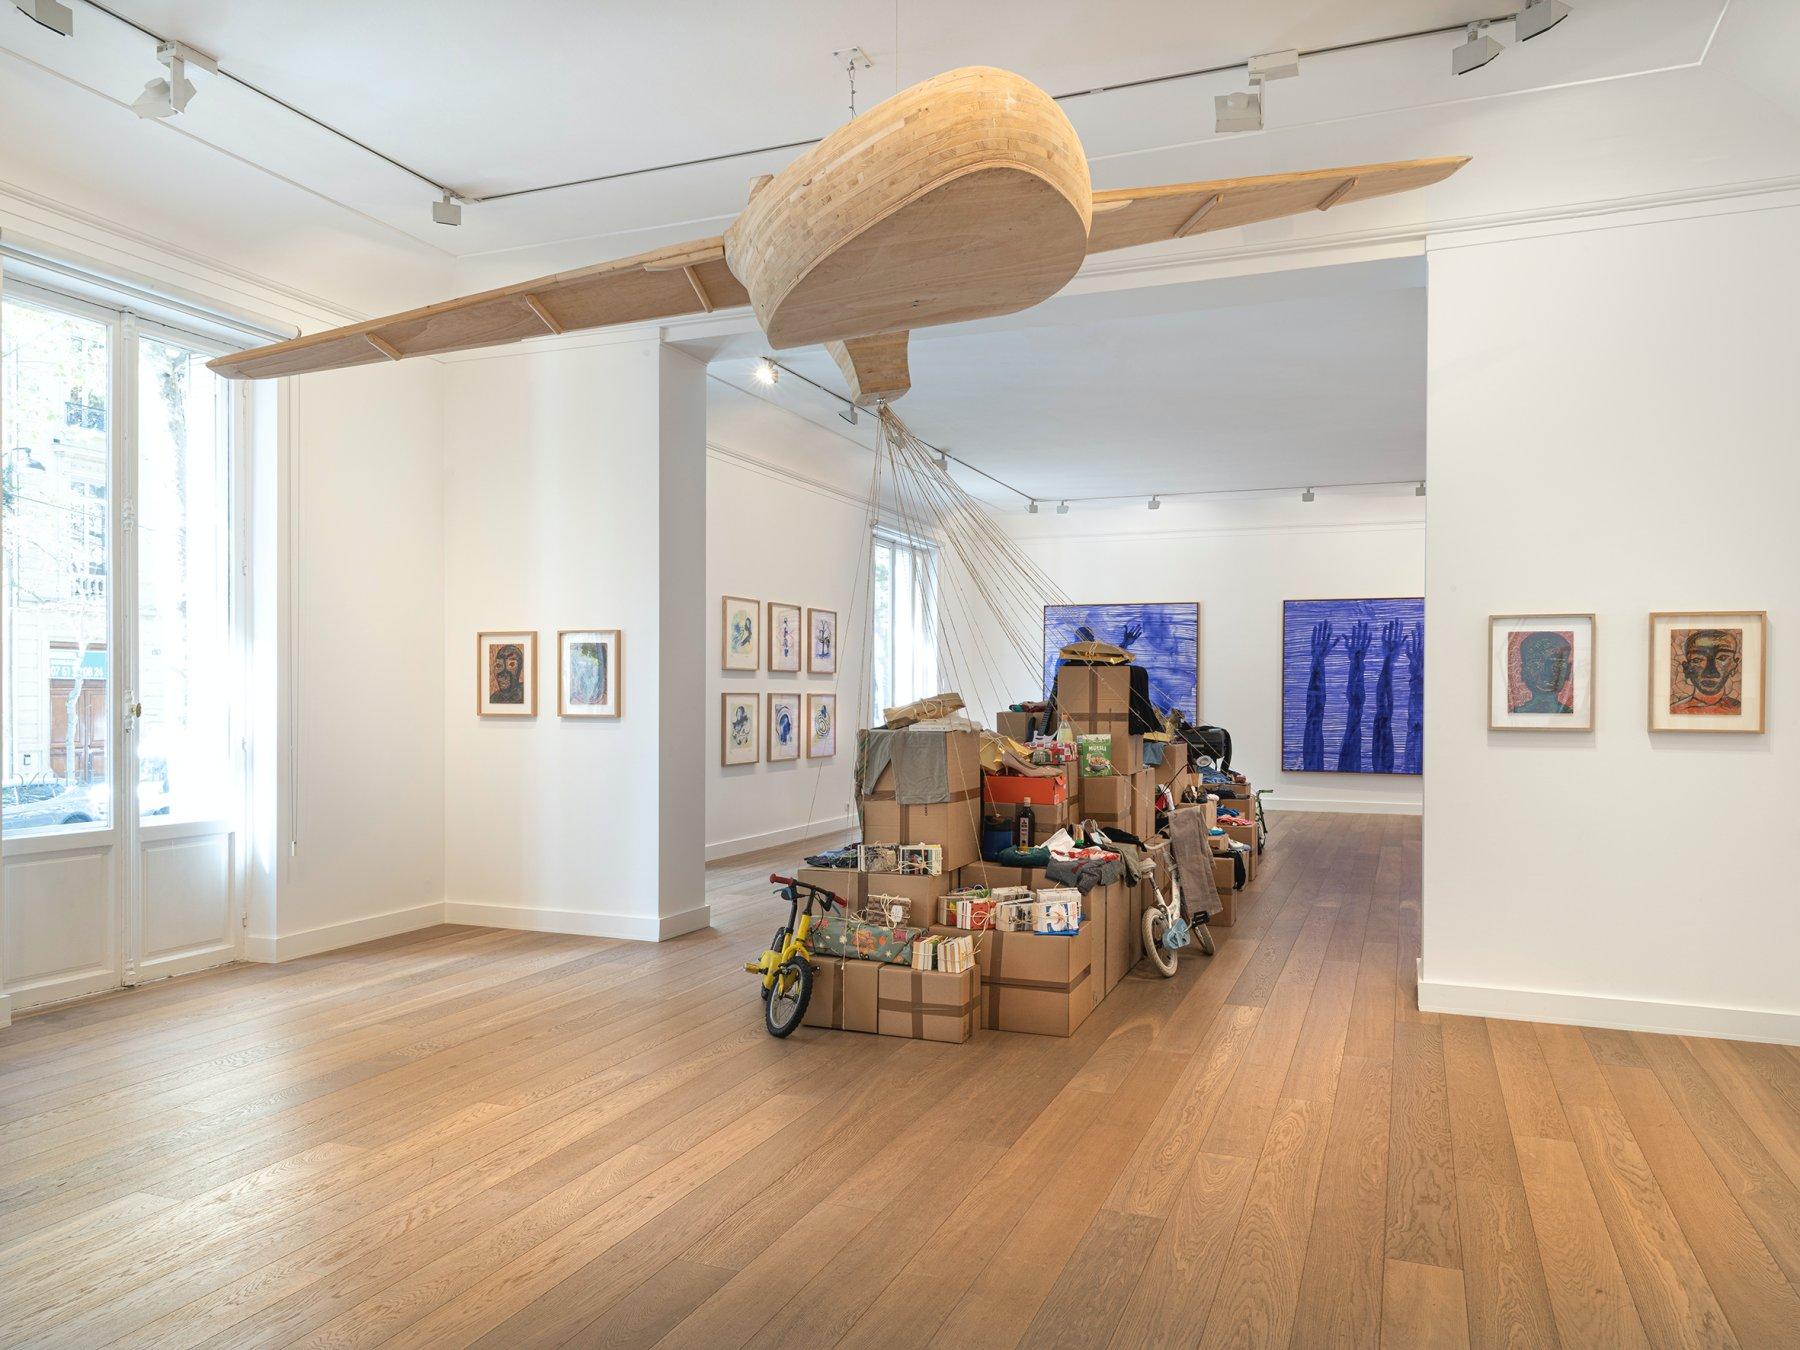 Galerie Lelong Co Barthelemy Toguo September 2021 1